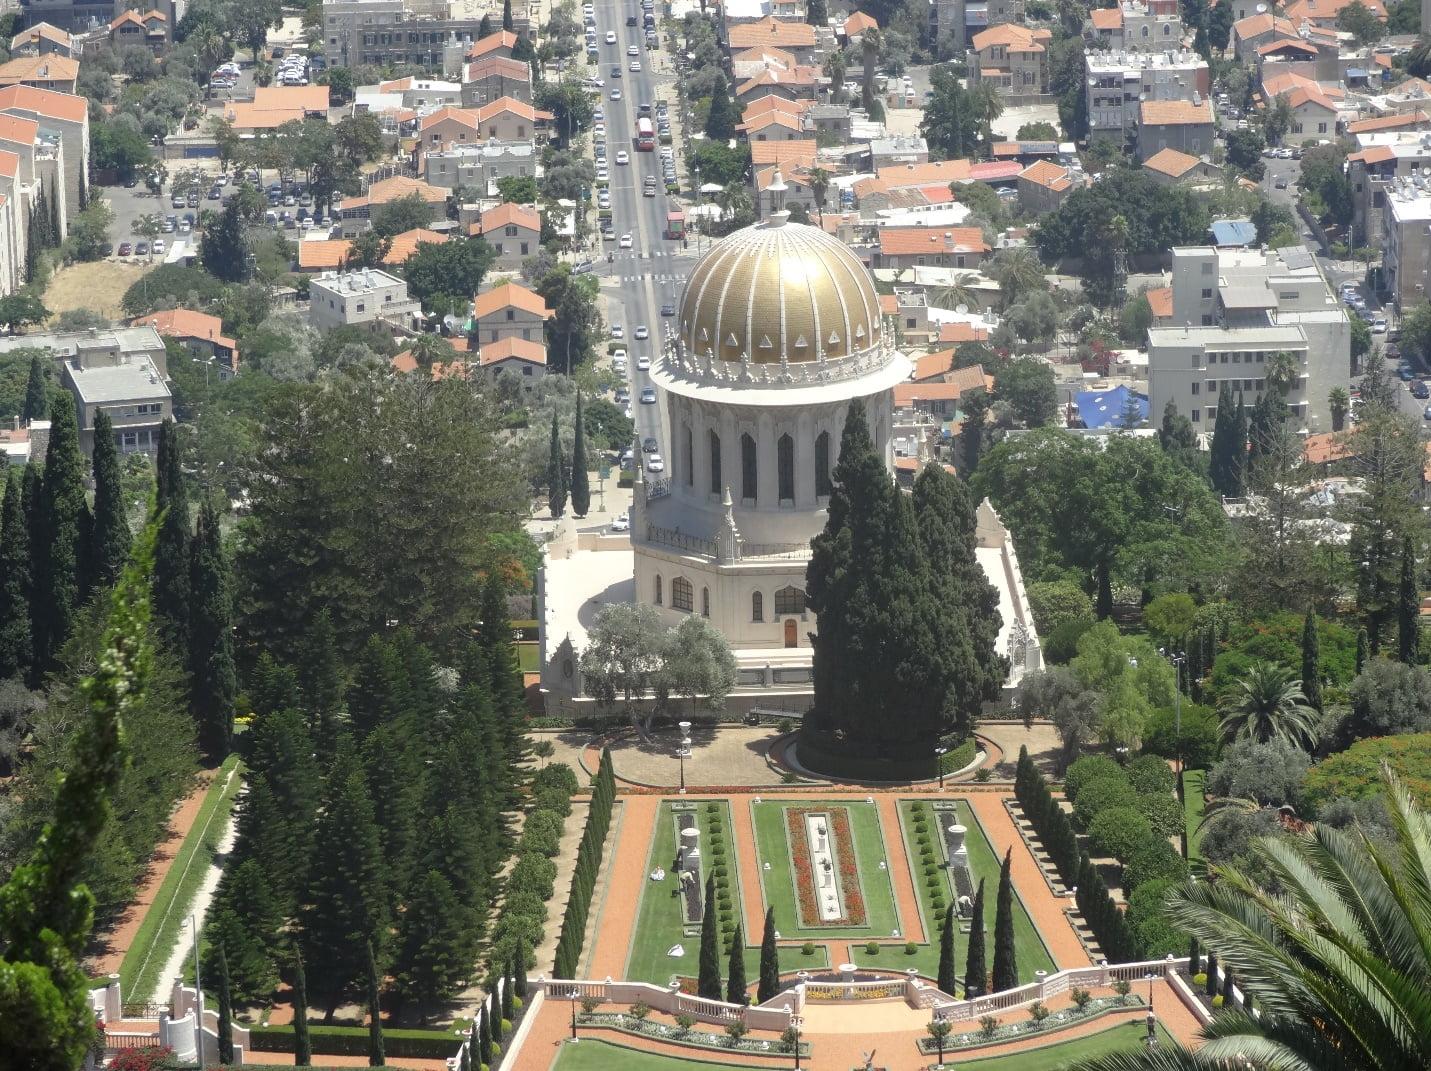 The Bahai temple in my hometown - Haifa, Israel